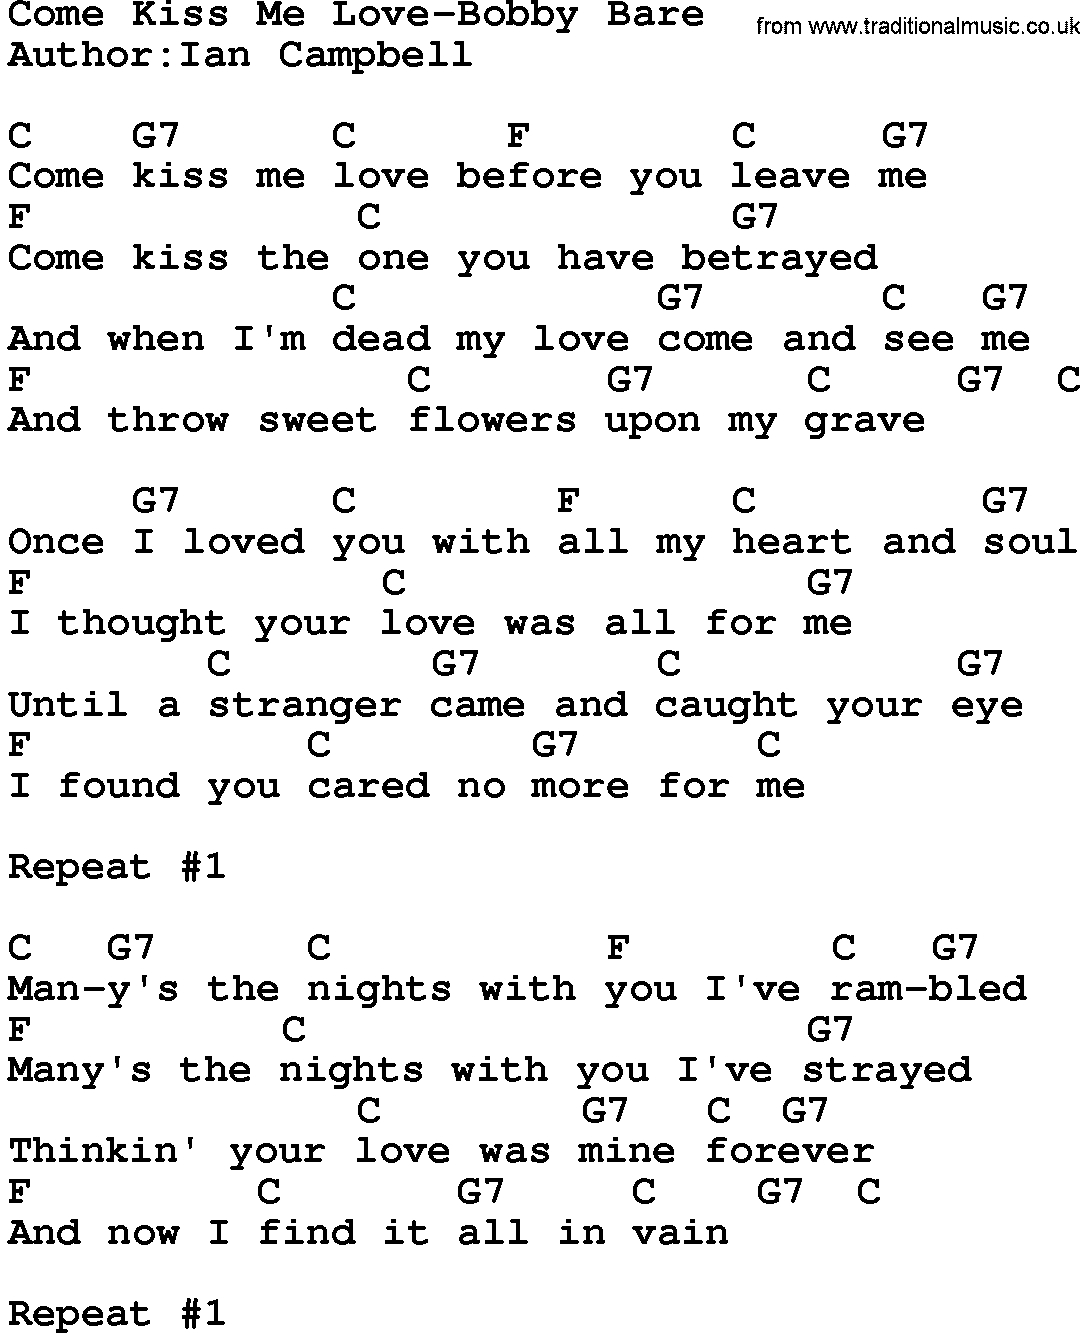 Kiss Me Chords Country Musiccome Kiss Me Love Bob Bare Lyrics And Chords